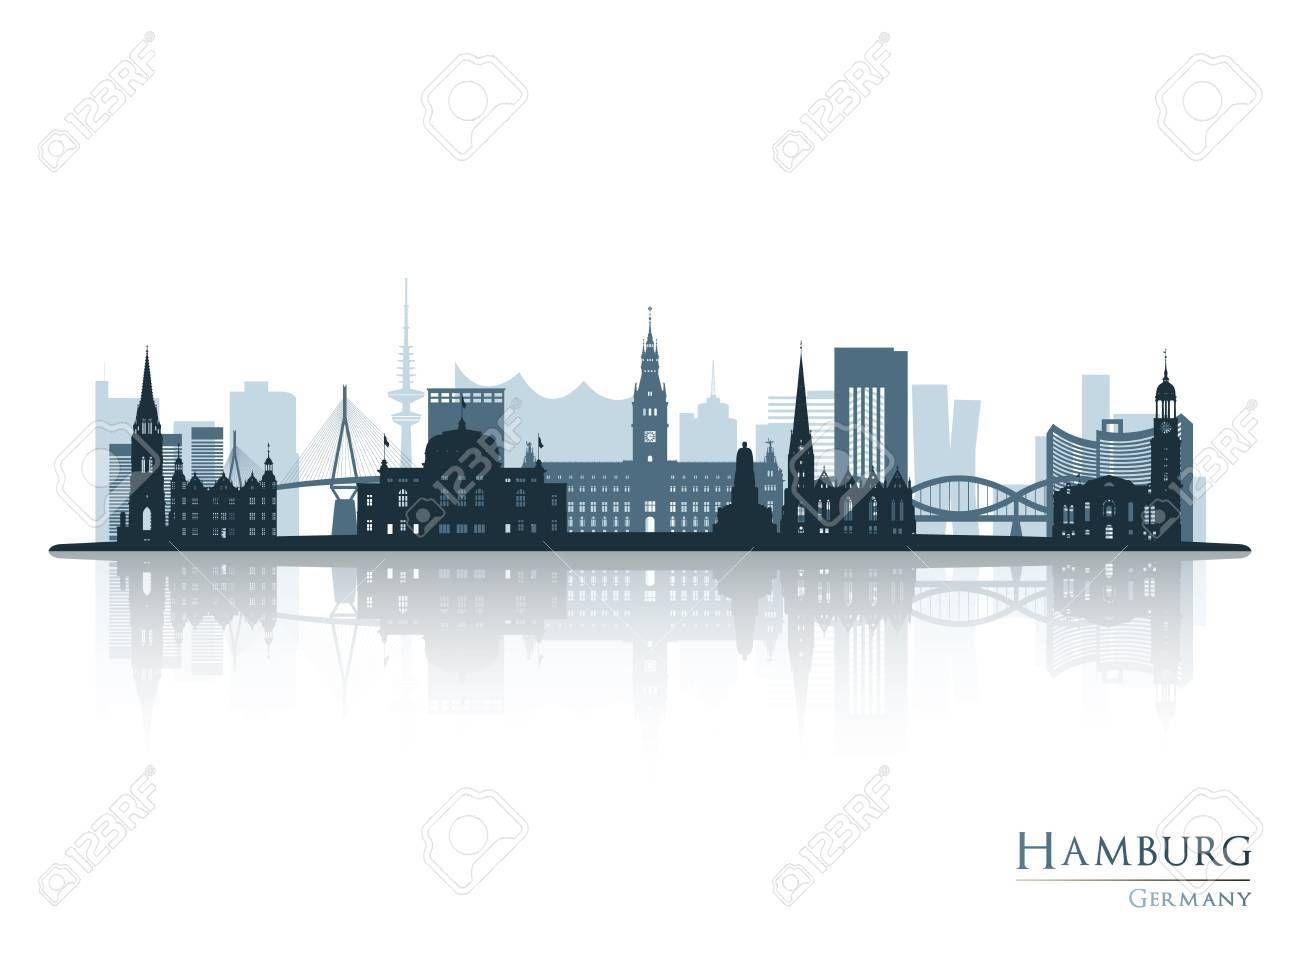 Hamburg Skyline Silhouette With Reflection Vector Illustration Sponsored Silhouette Skyline Hamburg Illustration Vector Hamburg